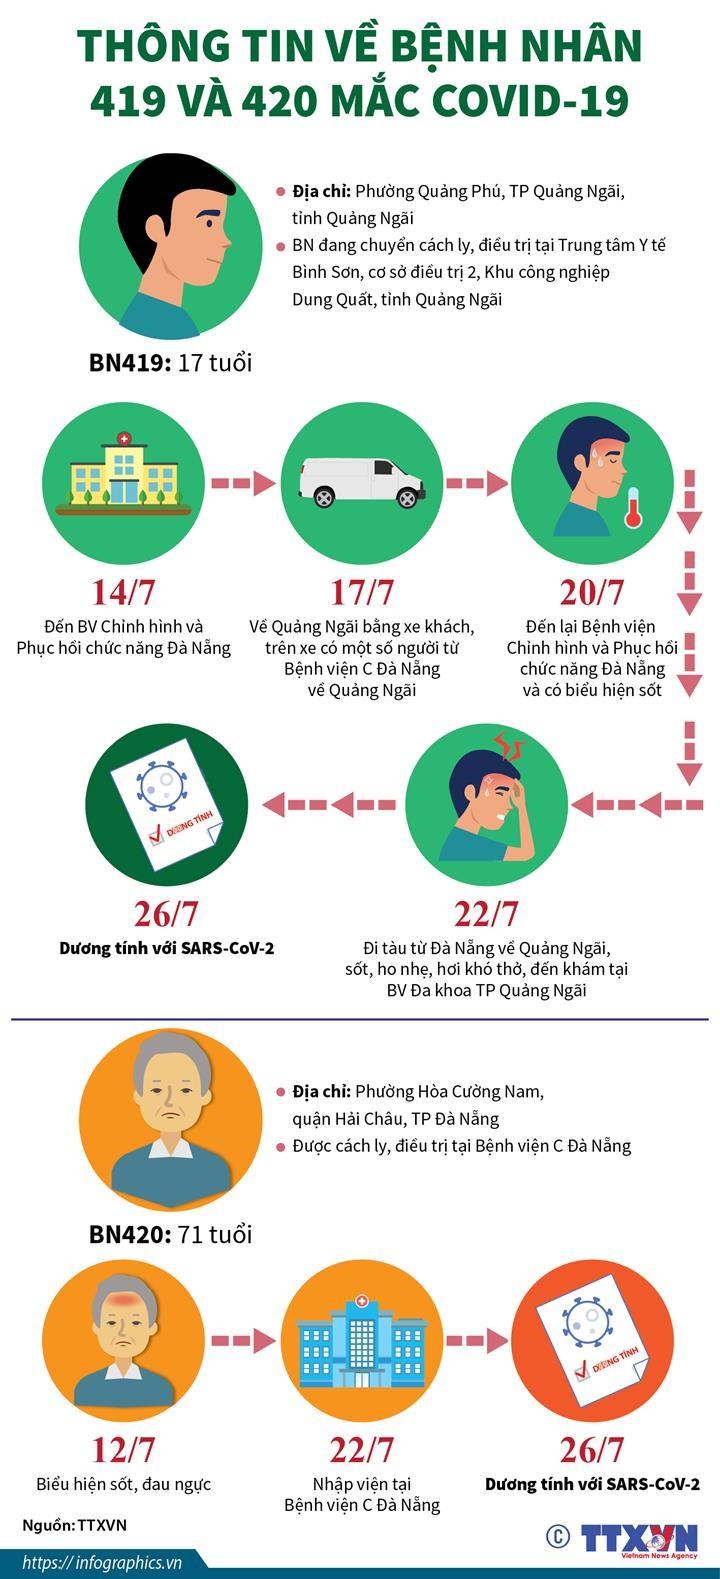 [Infographics] Thong tin ve benh nhan 419 va 420 mac COVID-19 hinh anh 1